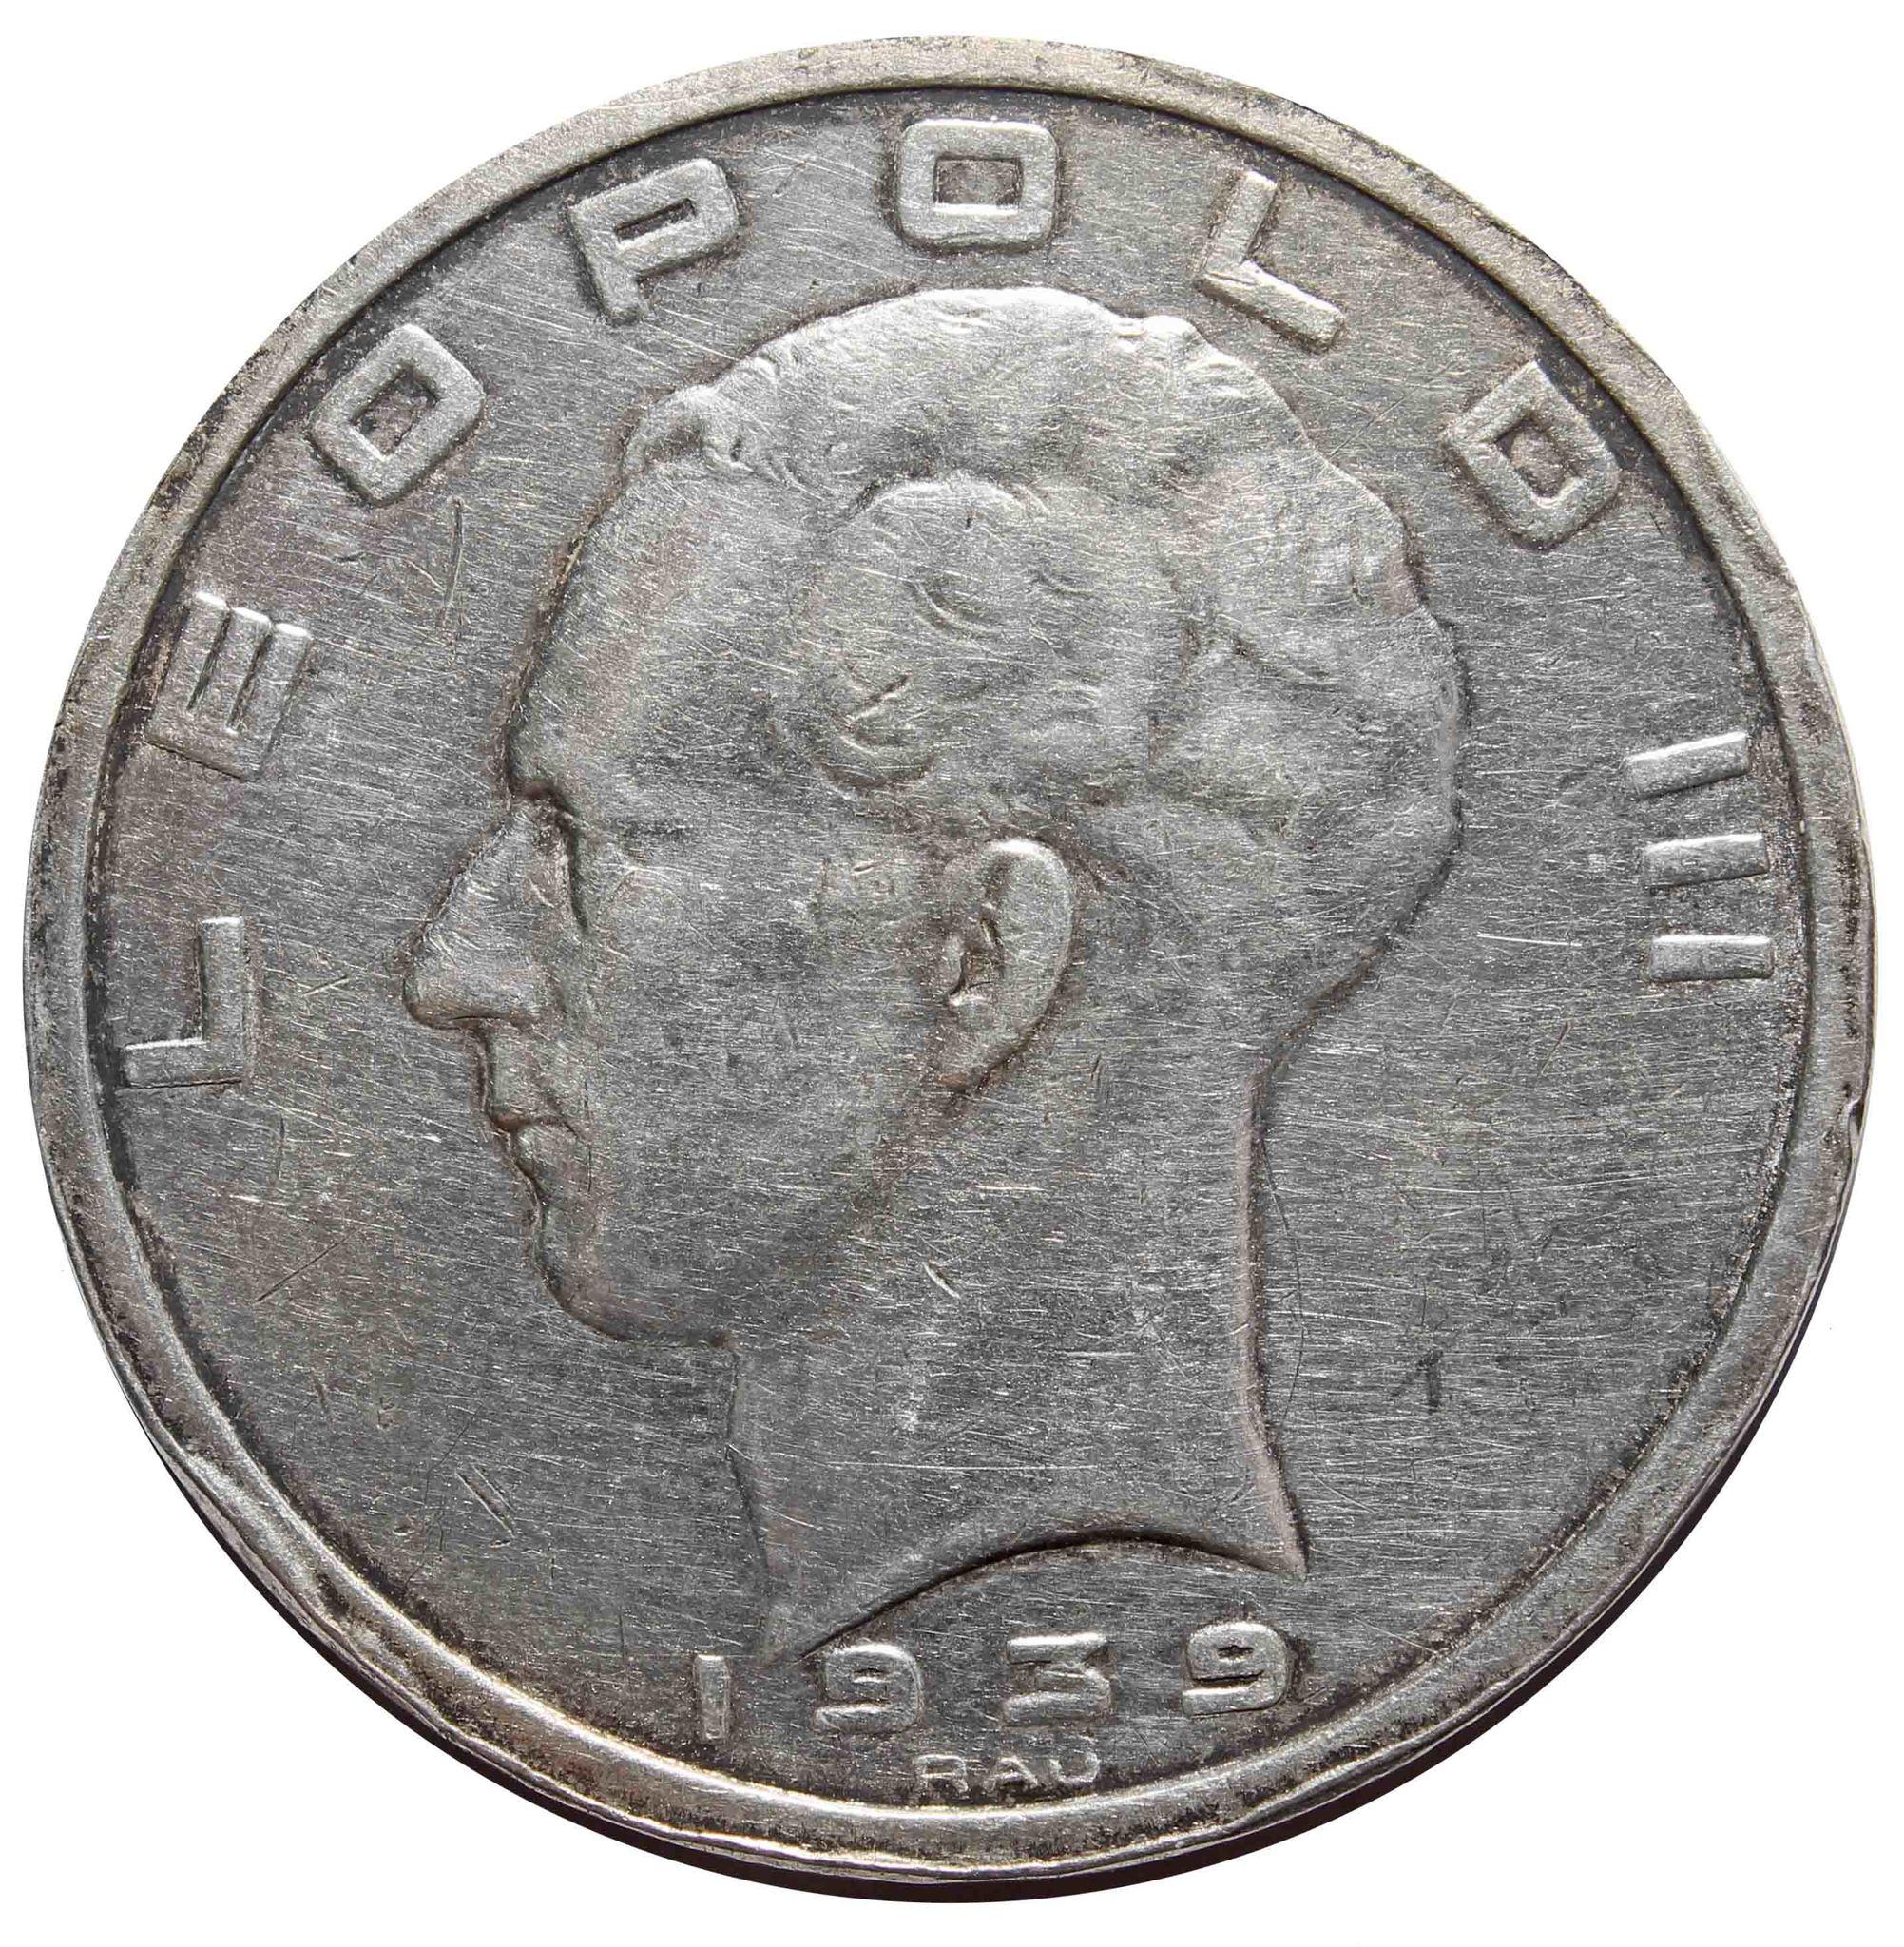 50 франков Леопольд III. Бельгия. 1939 год. Серебро VF-XF